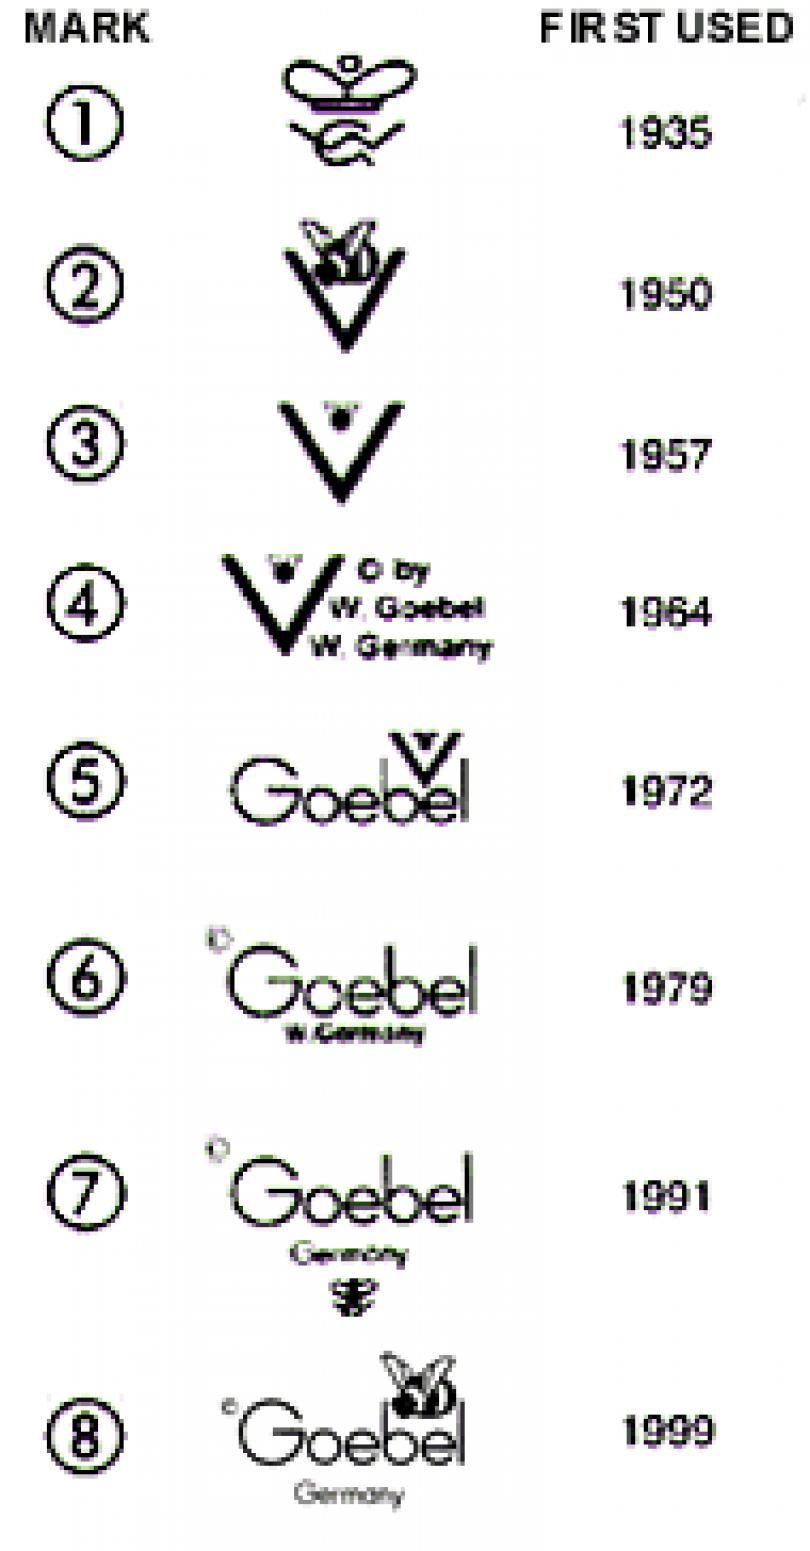 Hummel trademarks and value